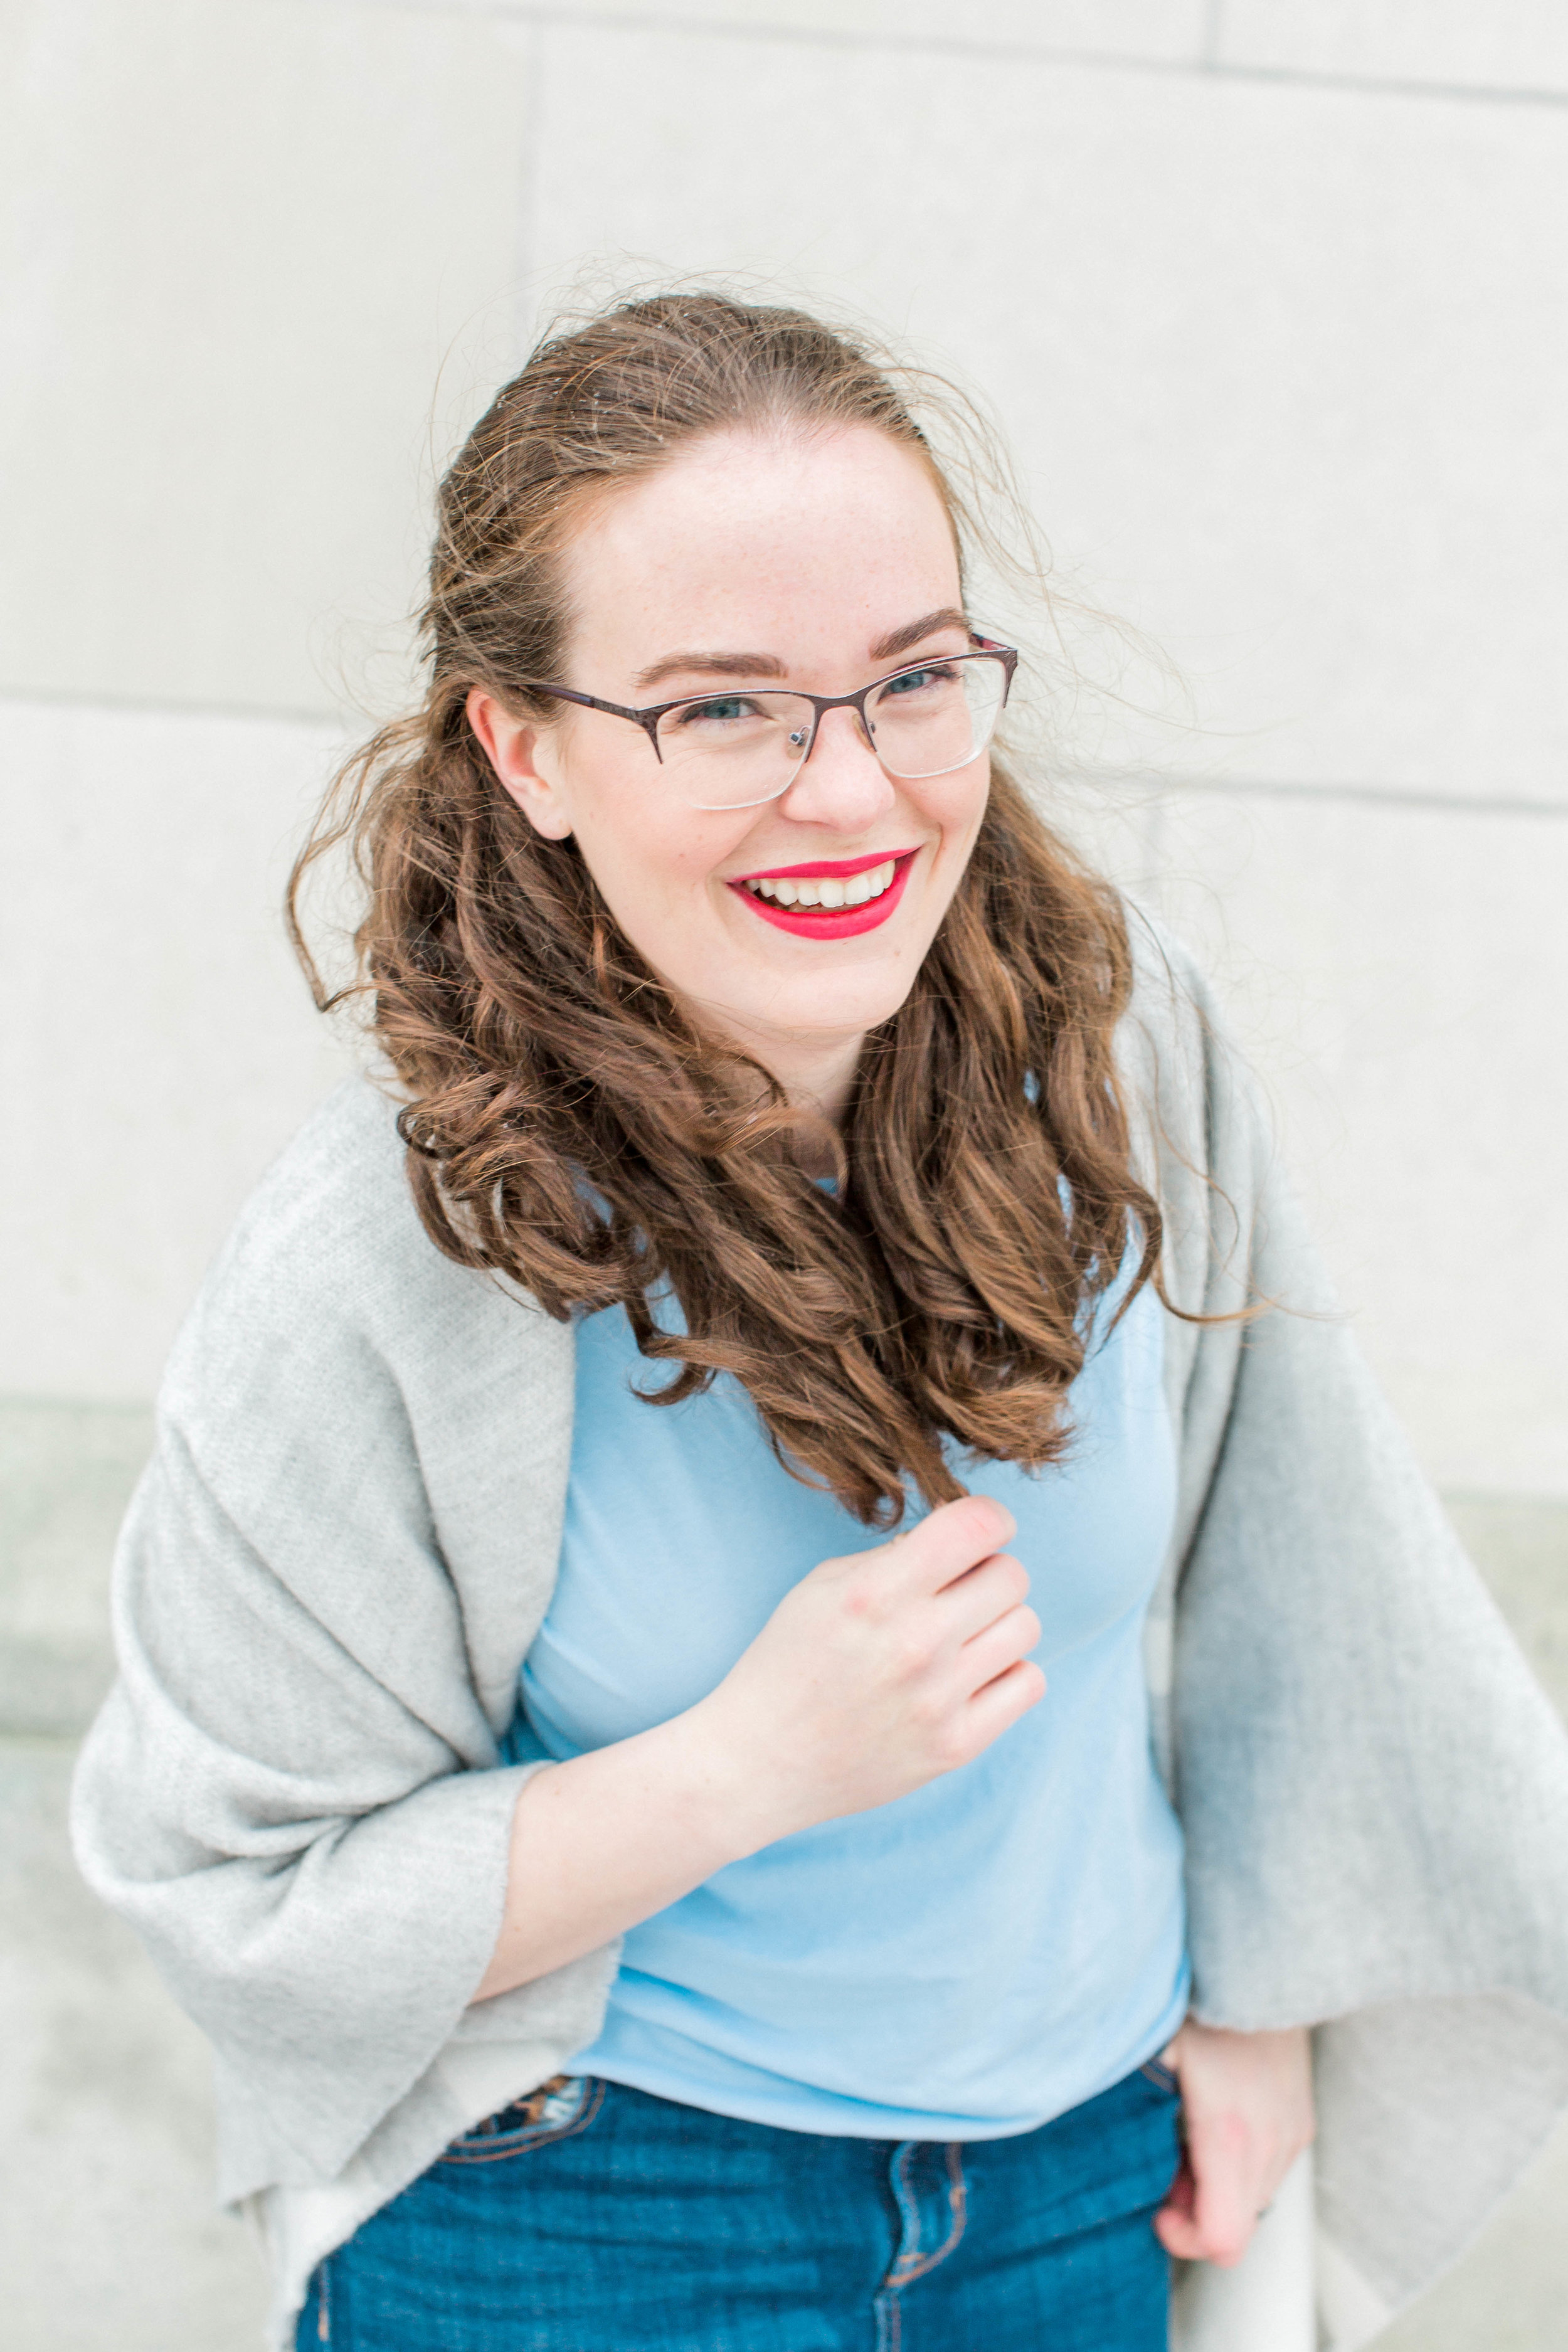 Sandra Kielback - Primary & Secondary Photographer